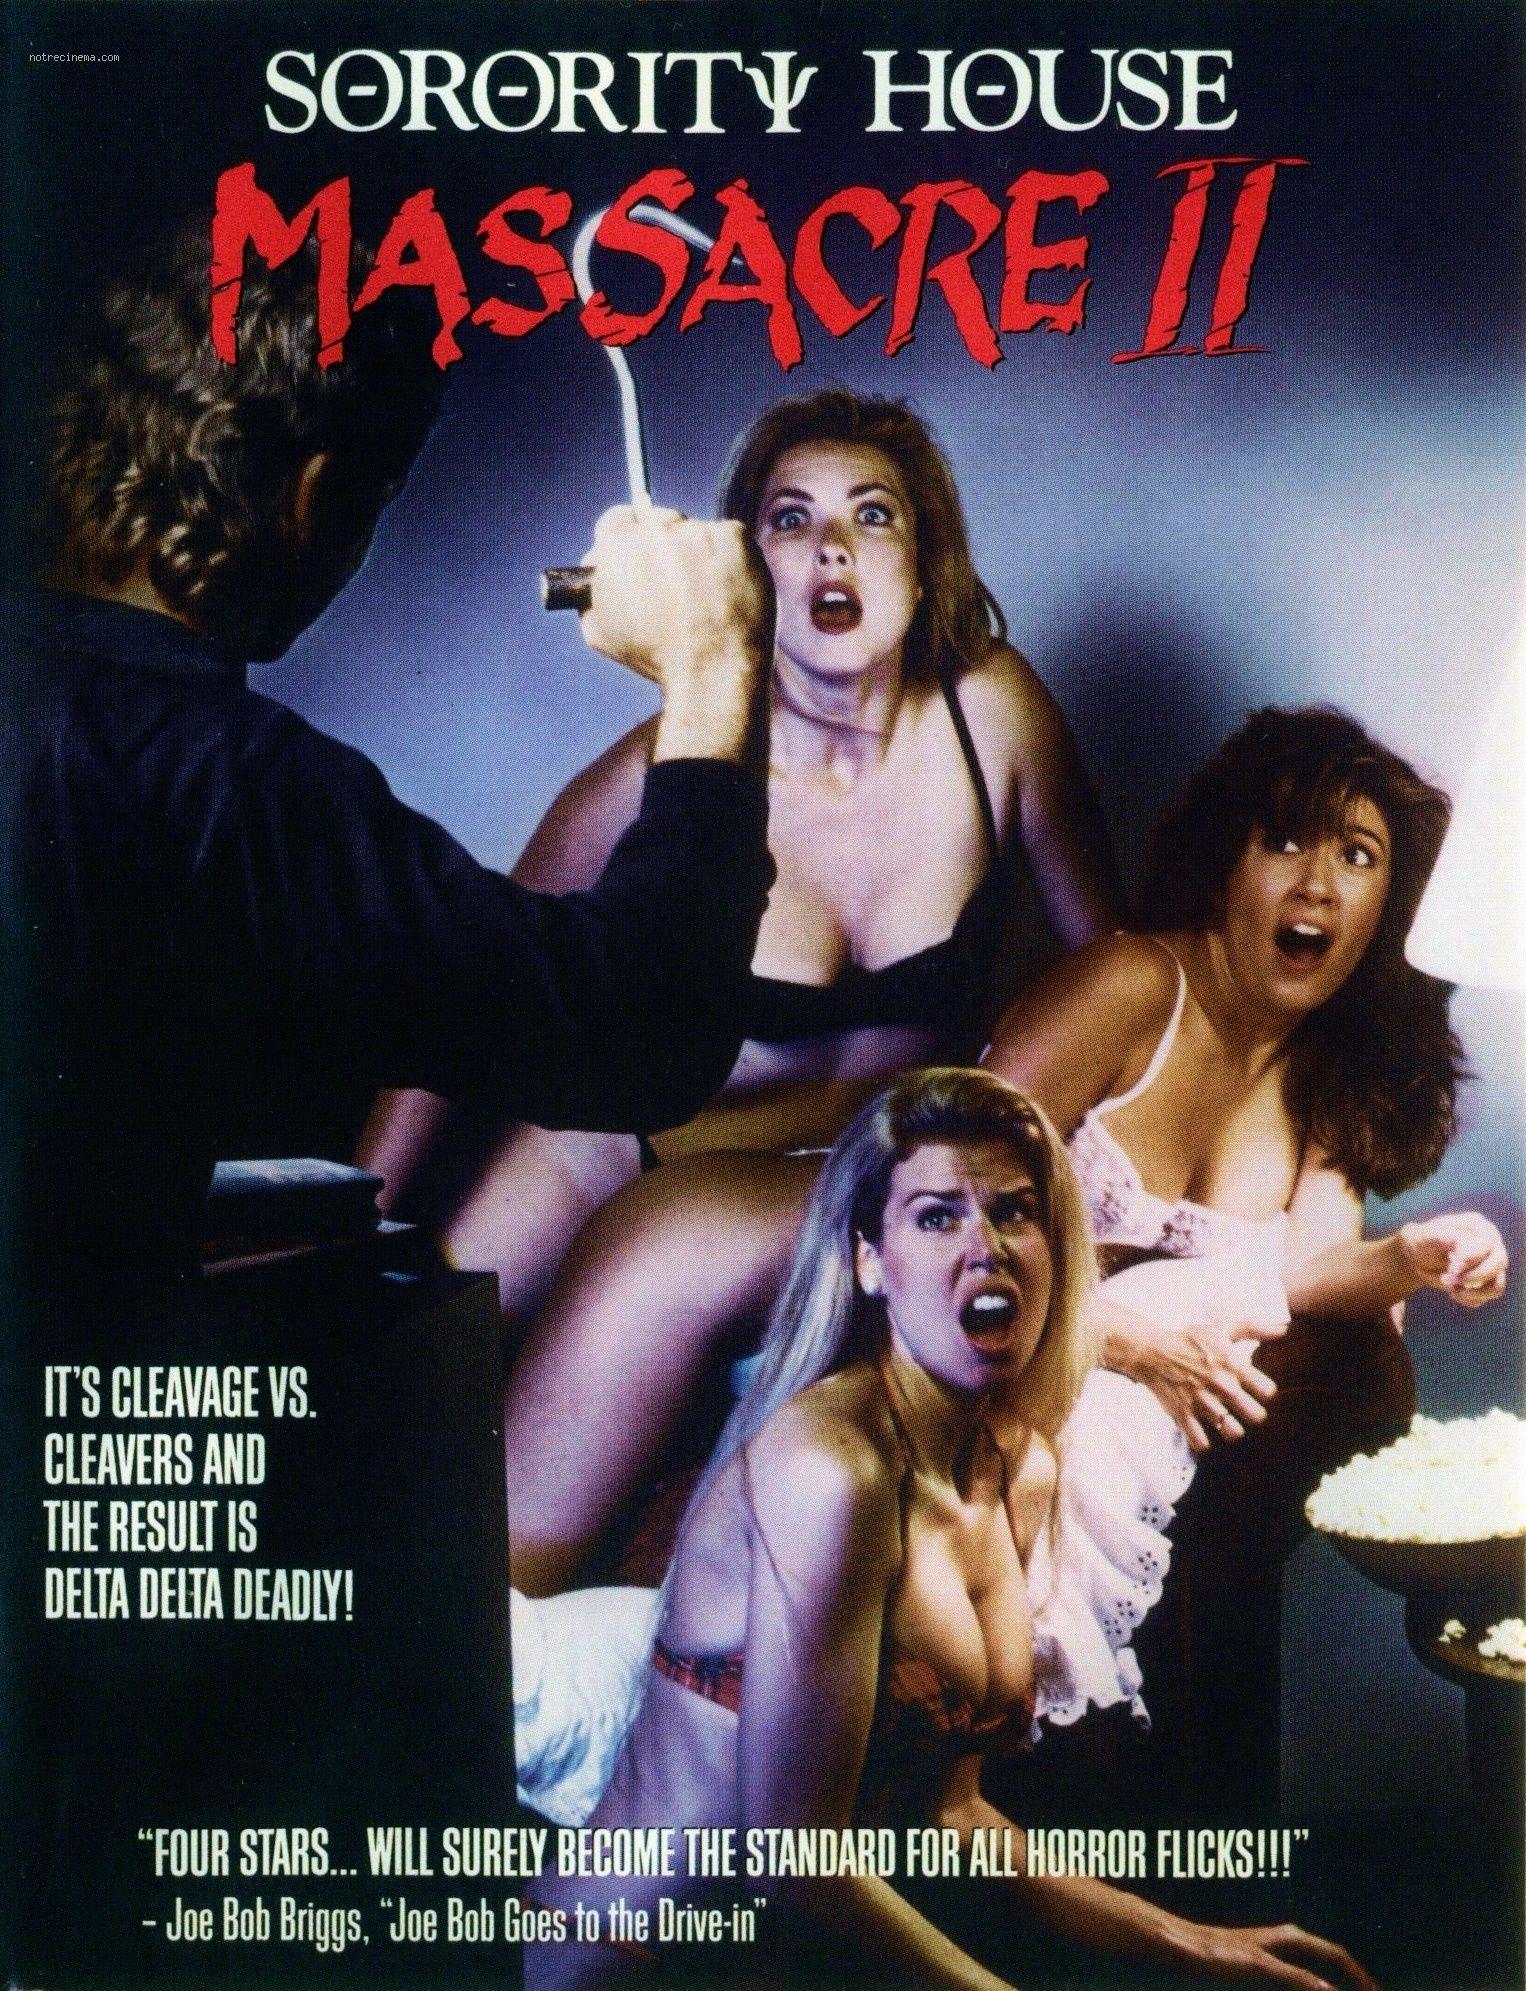 Sorority House Massacre 2 (1990)